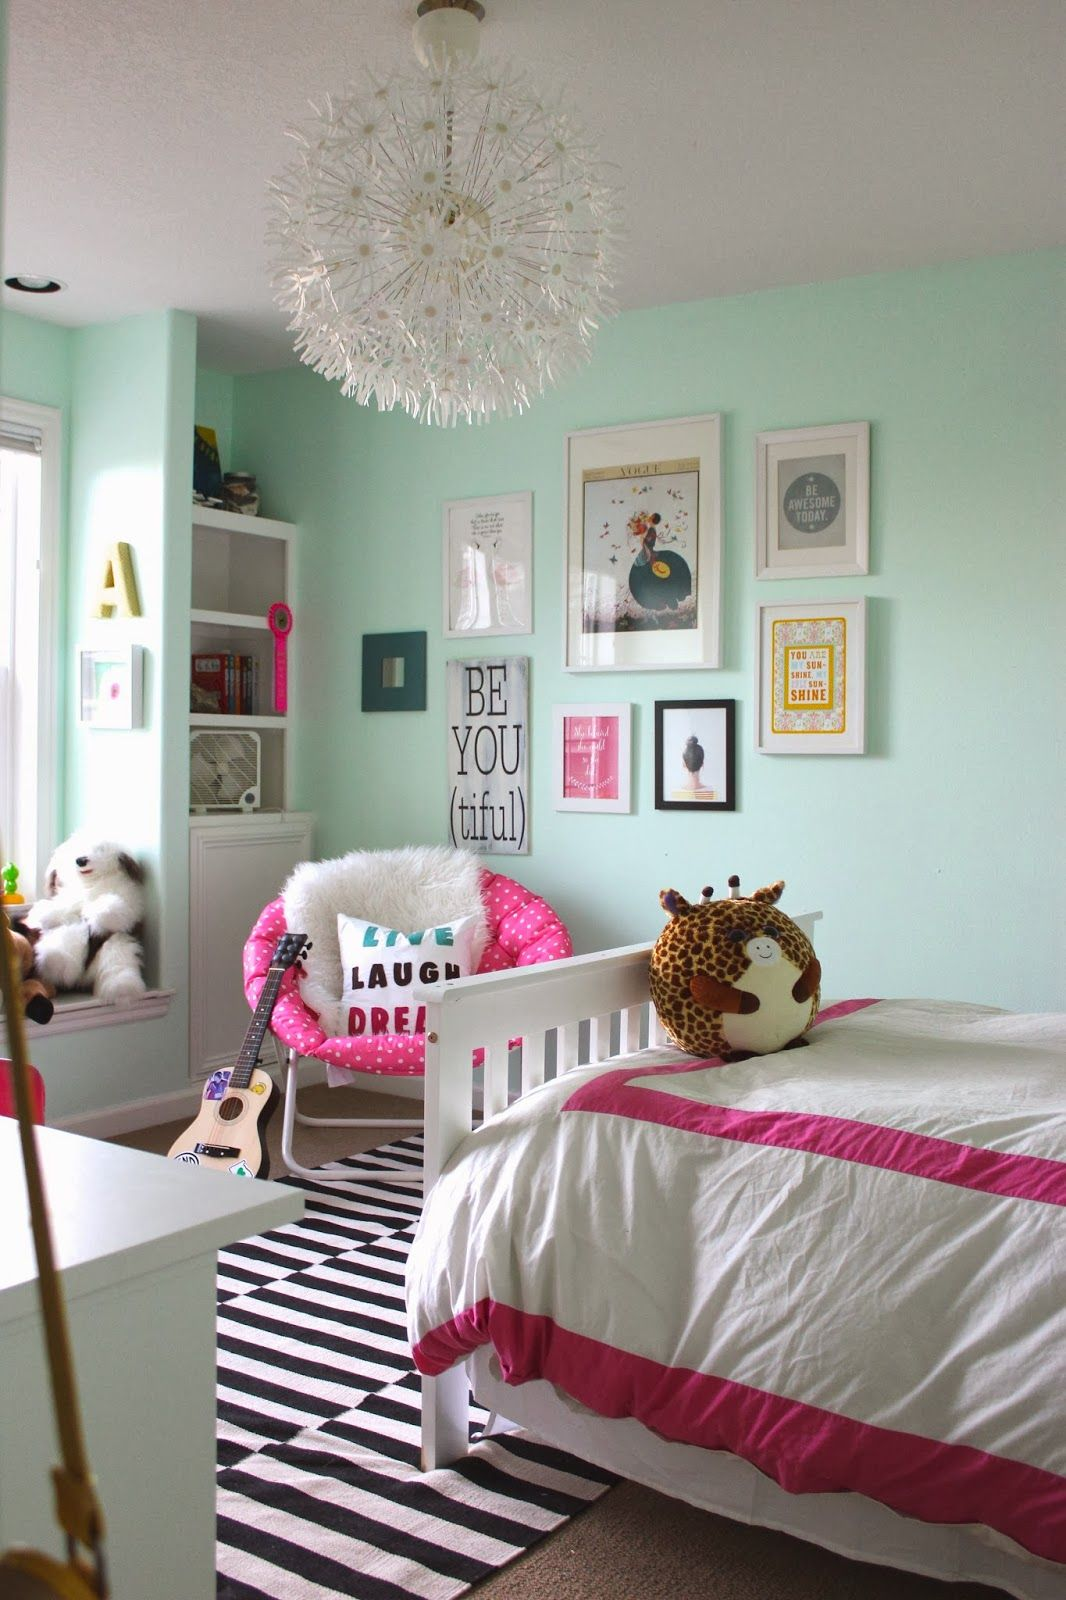 23 Stylish Teen Girl S Bedroom Ideas Homelovr